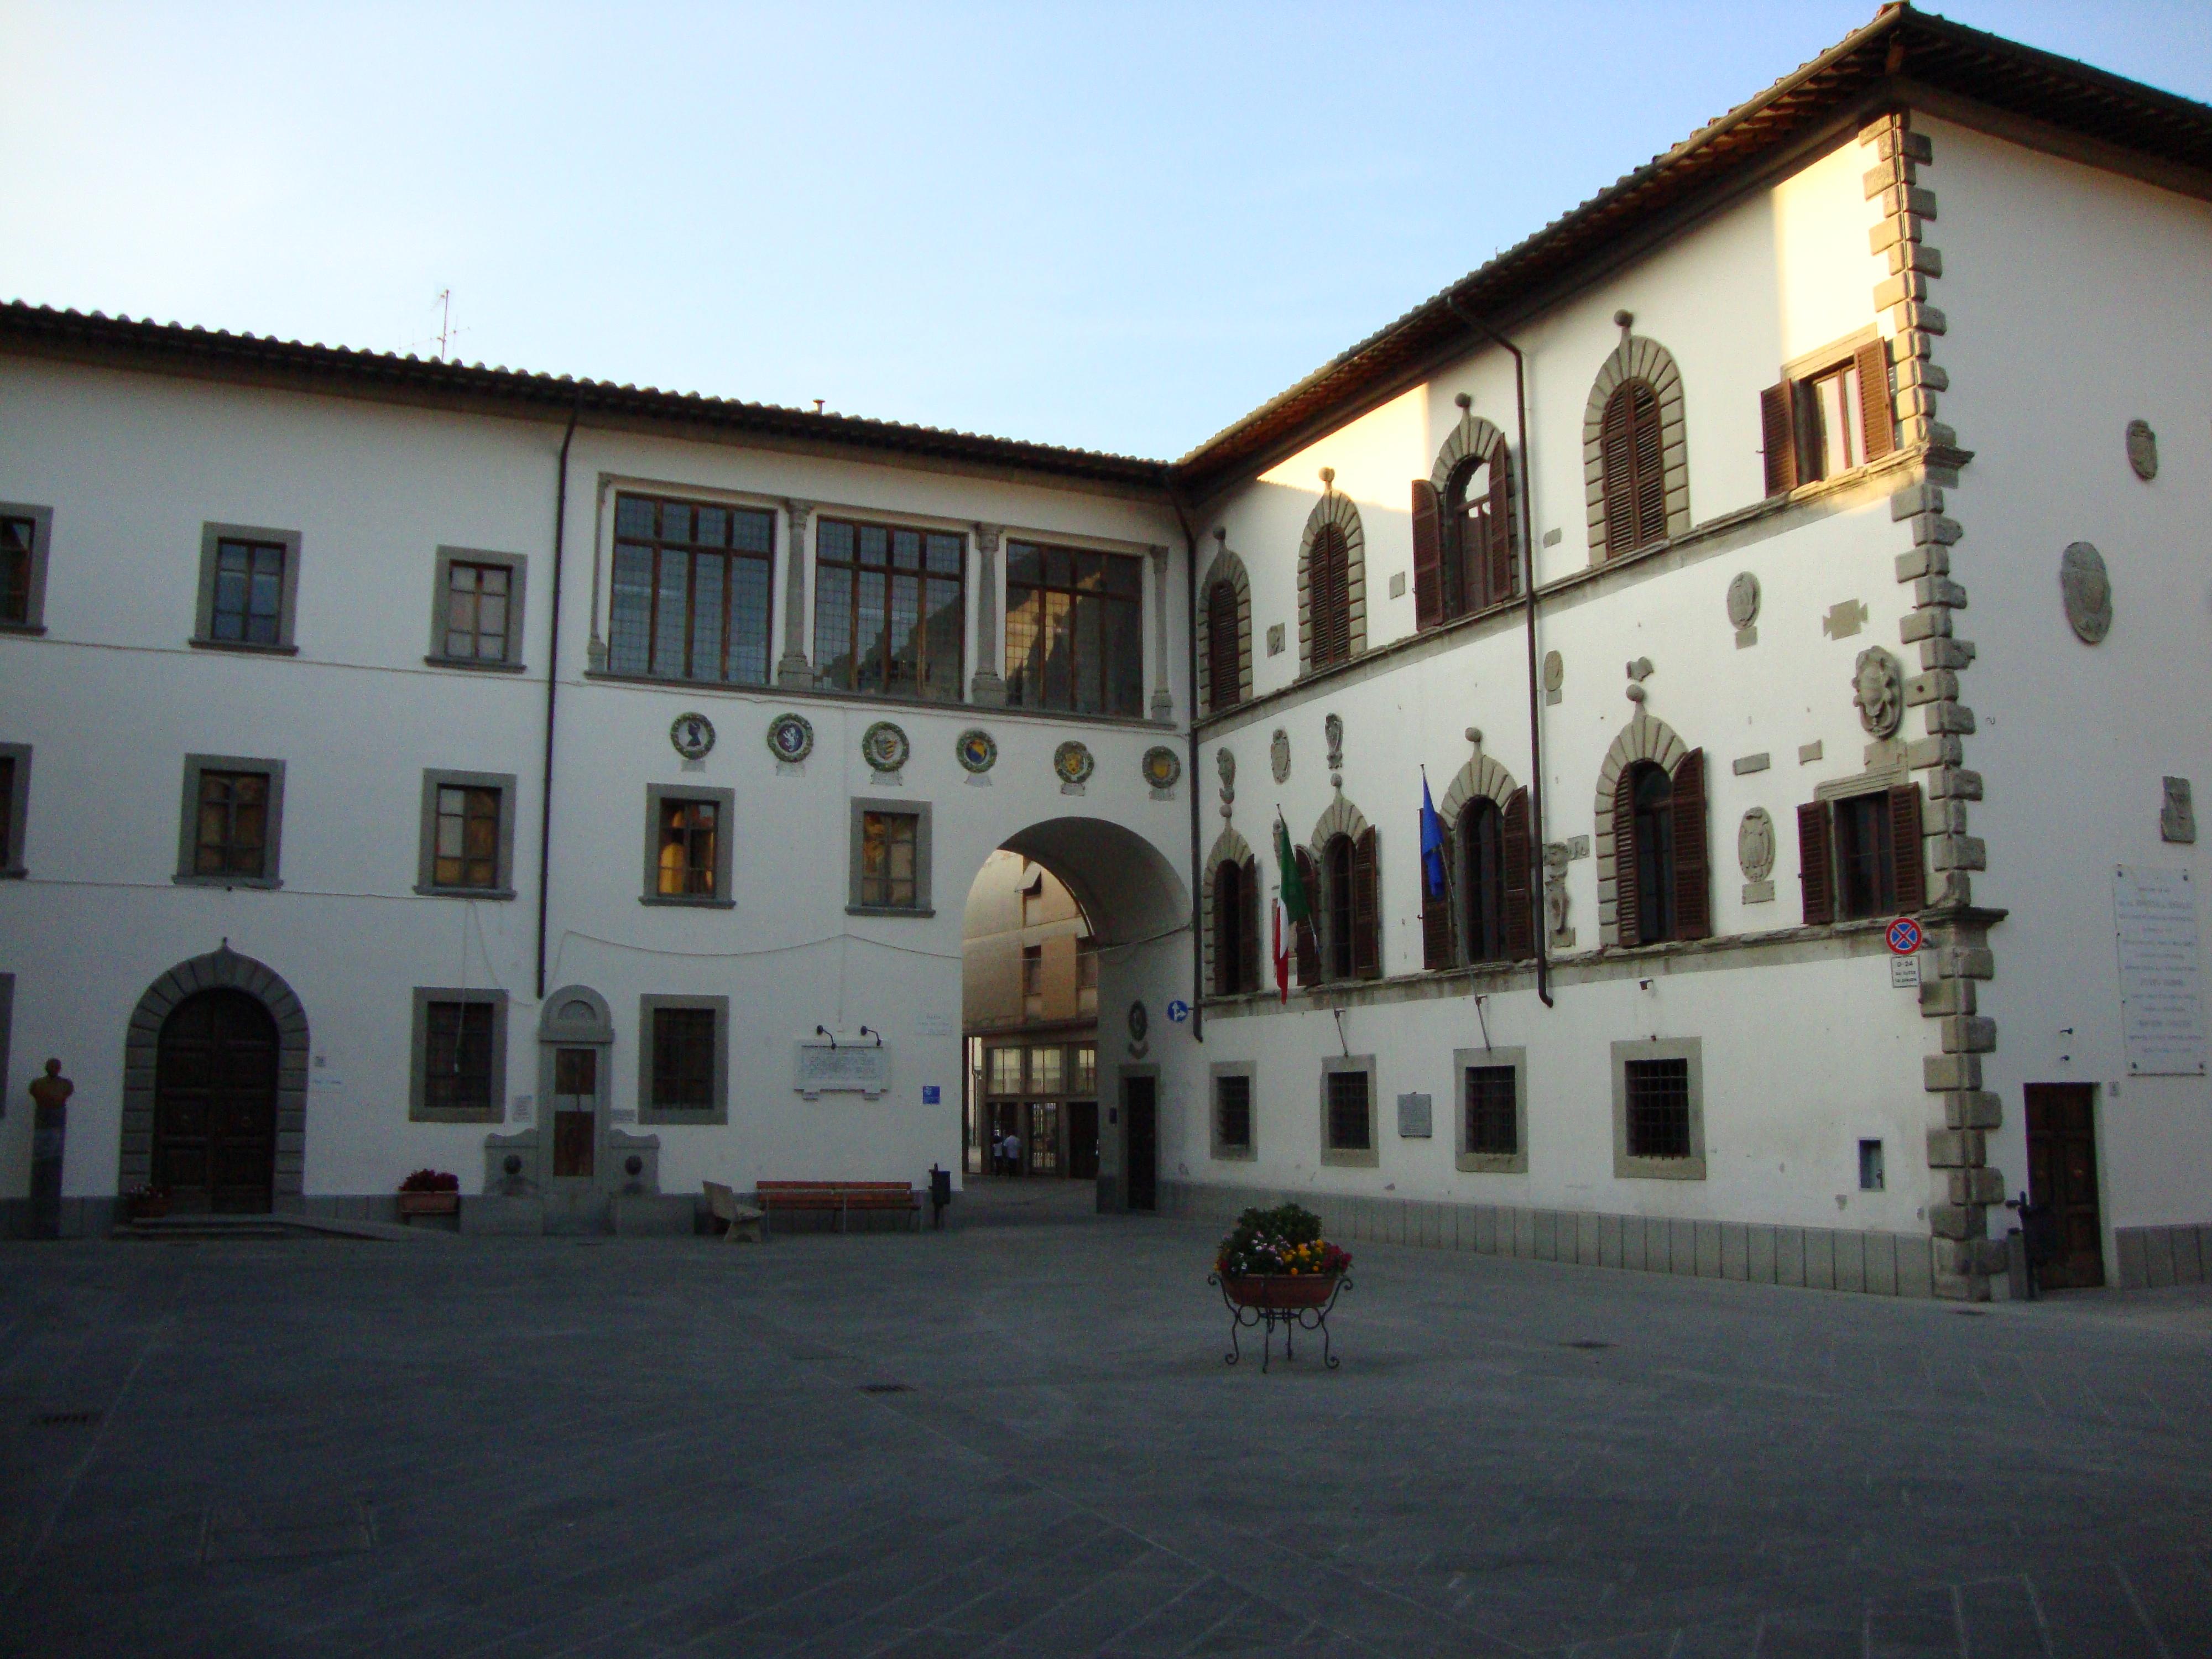 Pieve Santo Stefano Italy  City new picture : Description Pieve Santo Stefano Comune JPG